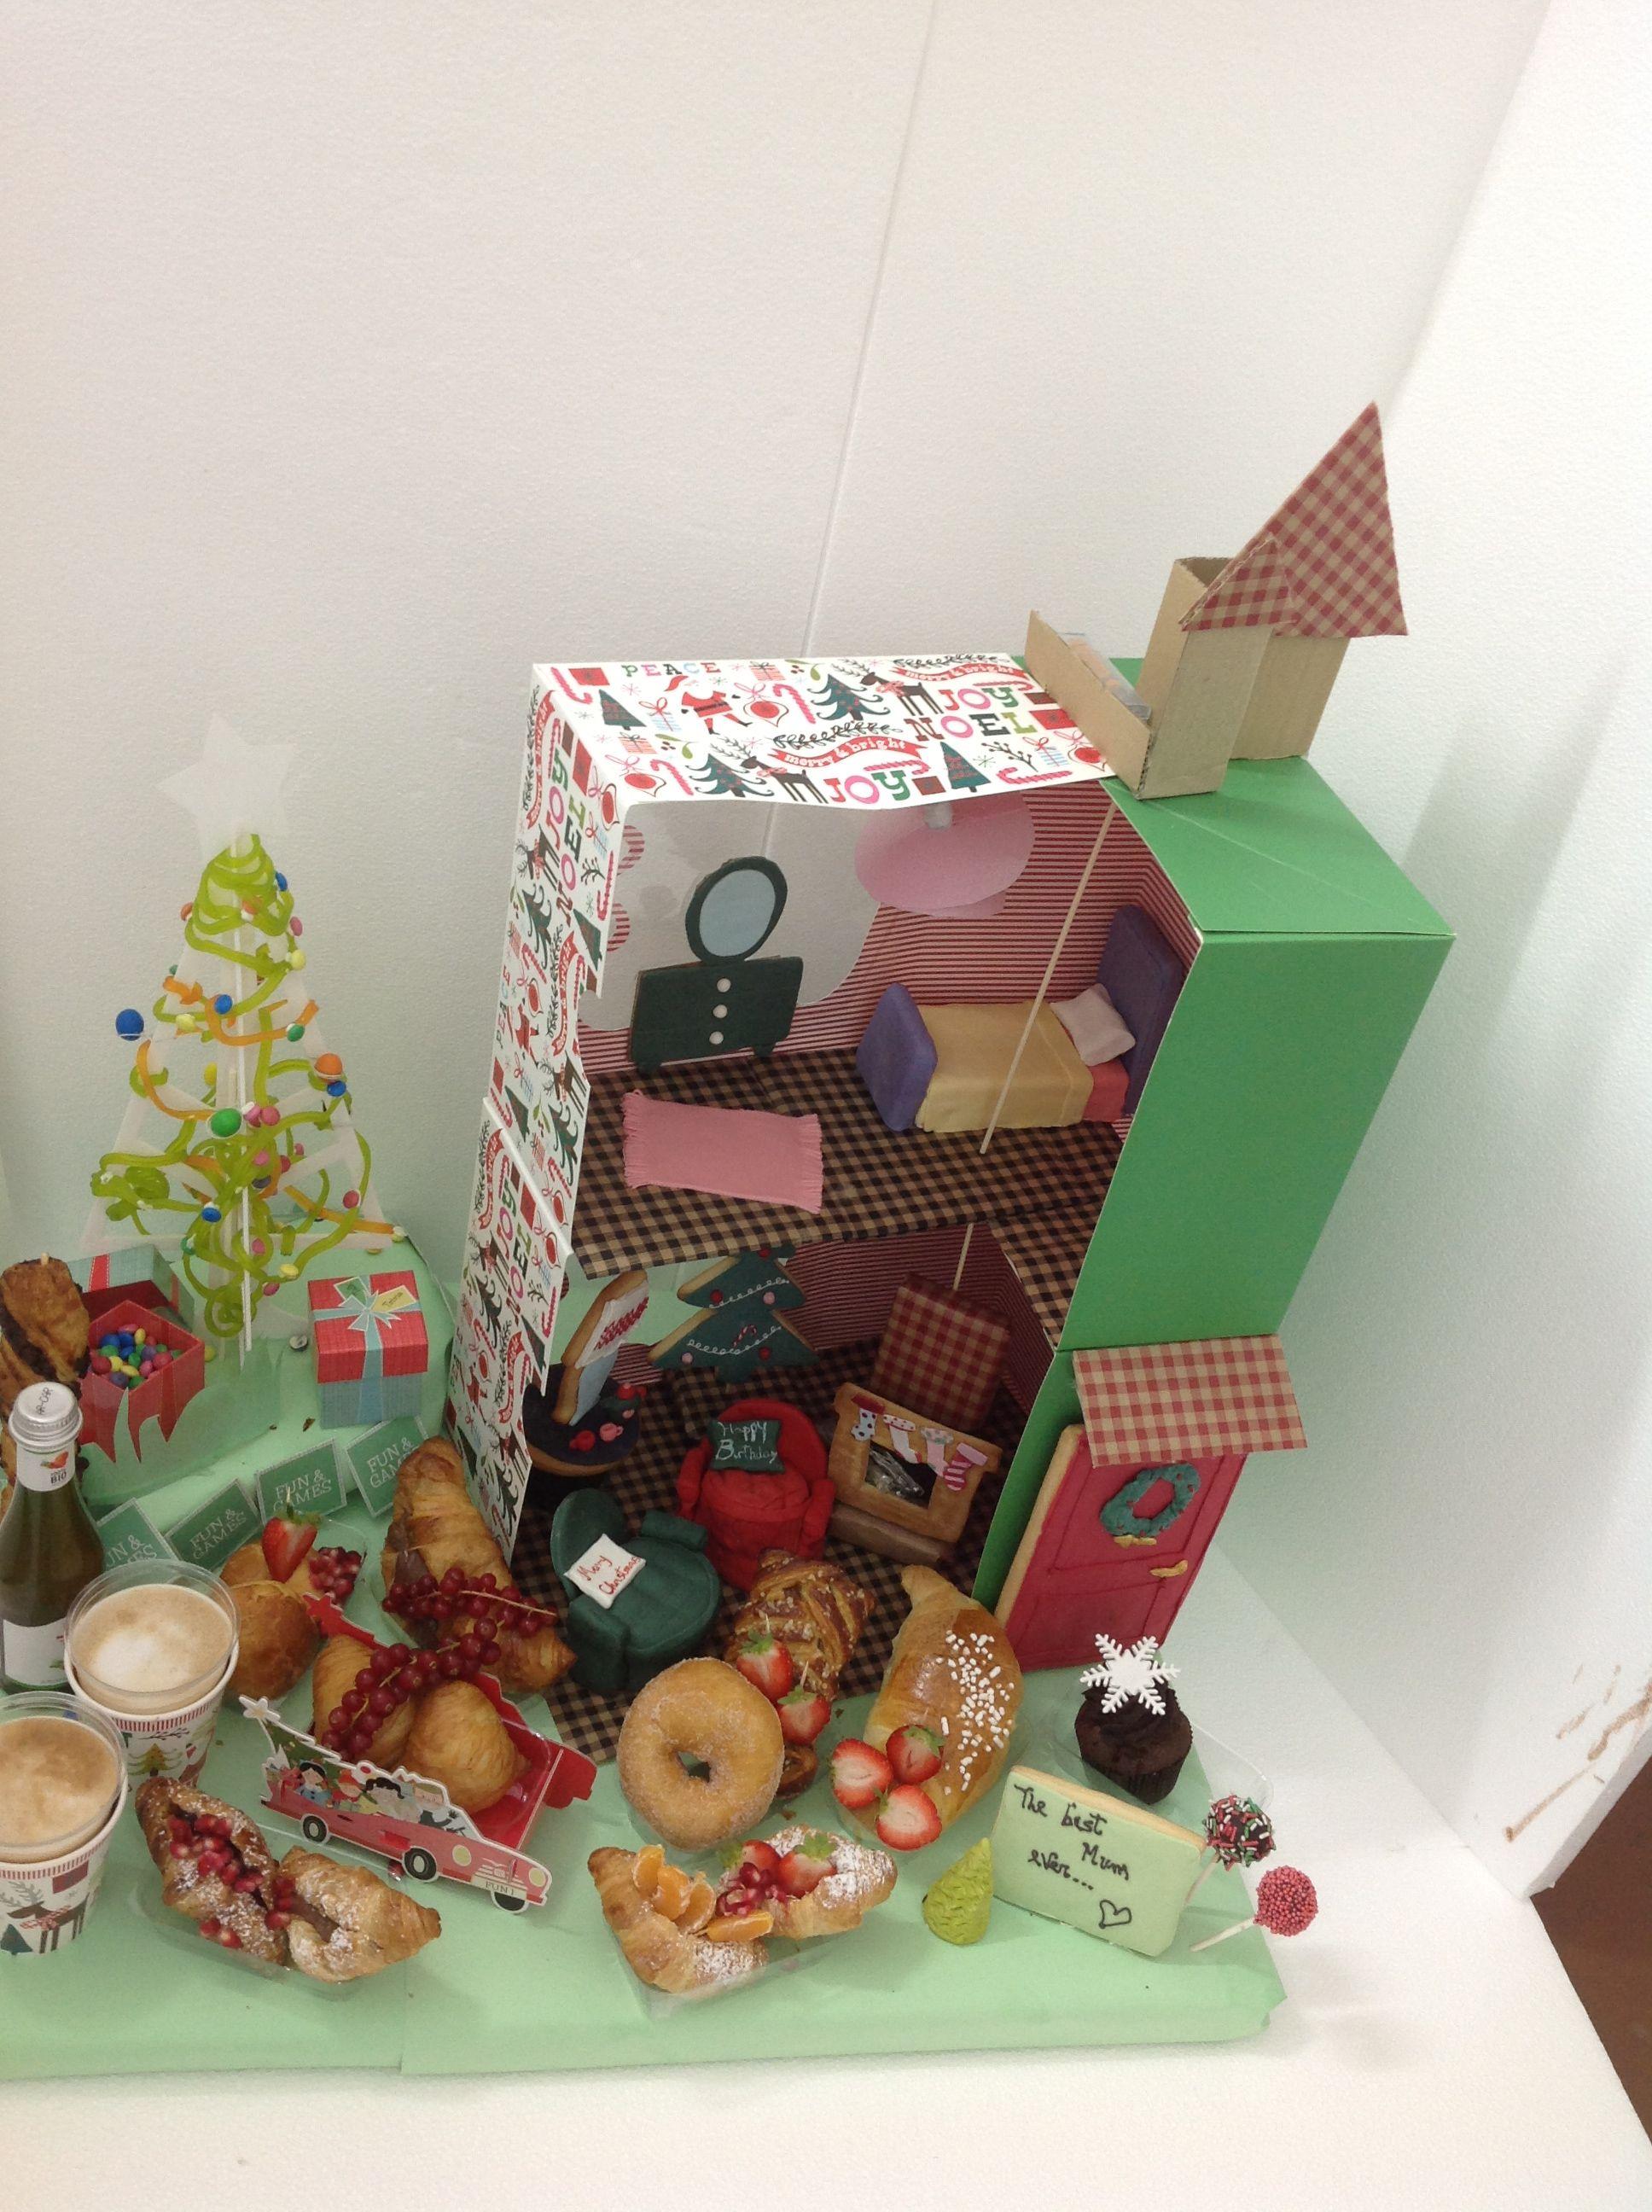 Santa's GIFT Today #Christmas #Greeting #christmasbreakfast ... I love our #new Double Floor #breakfast#doorBiscuit#RedDoor#Cookies#chistmashouse#santa#christmasgift #Dolls#Chococale#croissant#muffin#sfogliatella#funny#redDoor#Biscuit#sofacupcakes #cupcakes#cornetto#ballerina#MashmellowTree#Smarties#colazione#sessaspecialeventandcakes #sessaartigianidelgusto#Chimney##SittingRoom#AirmChairCupcake#donuts#ChristmasTree#Pomegrade#bedBiscuit